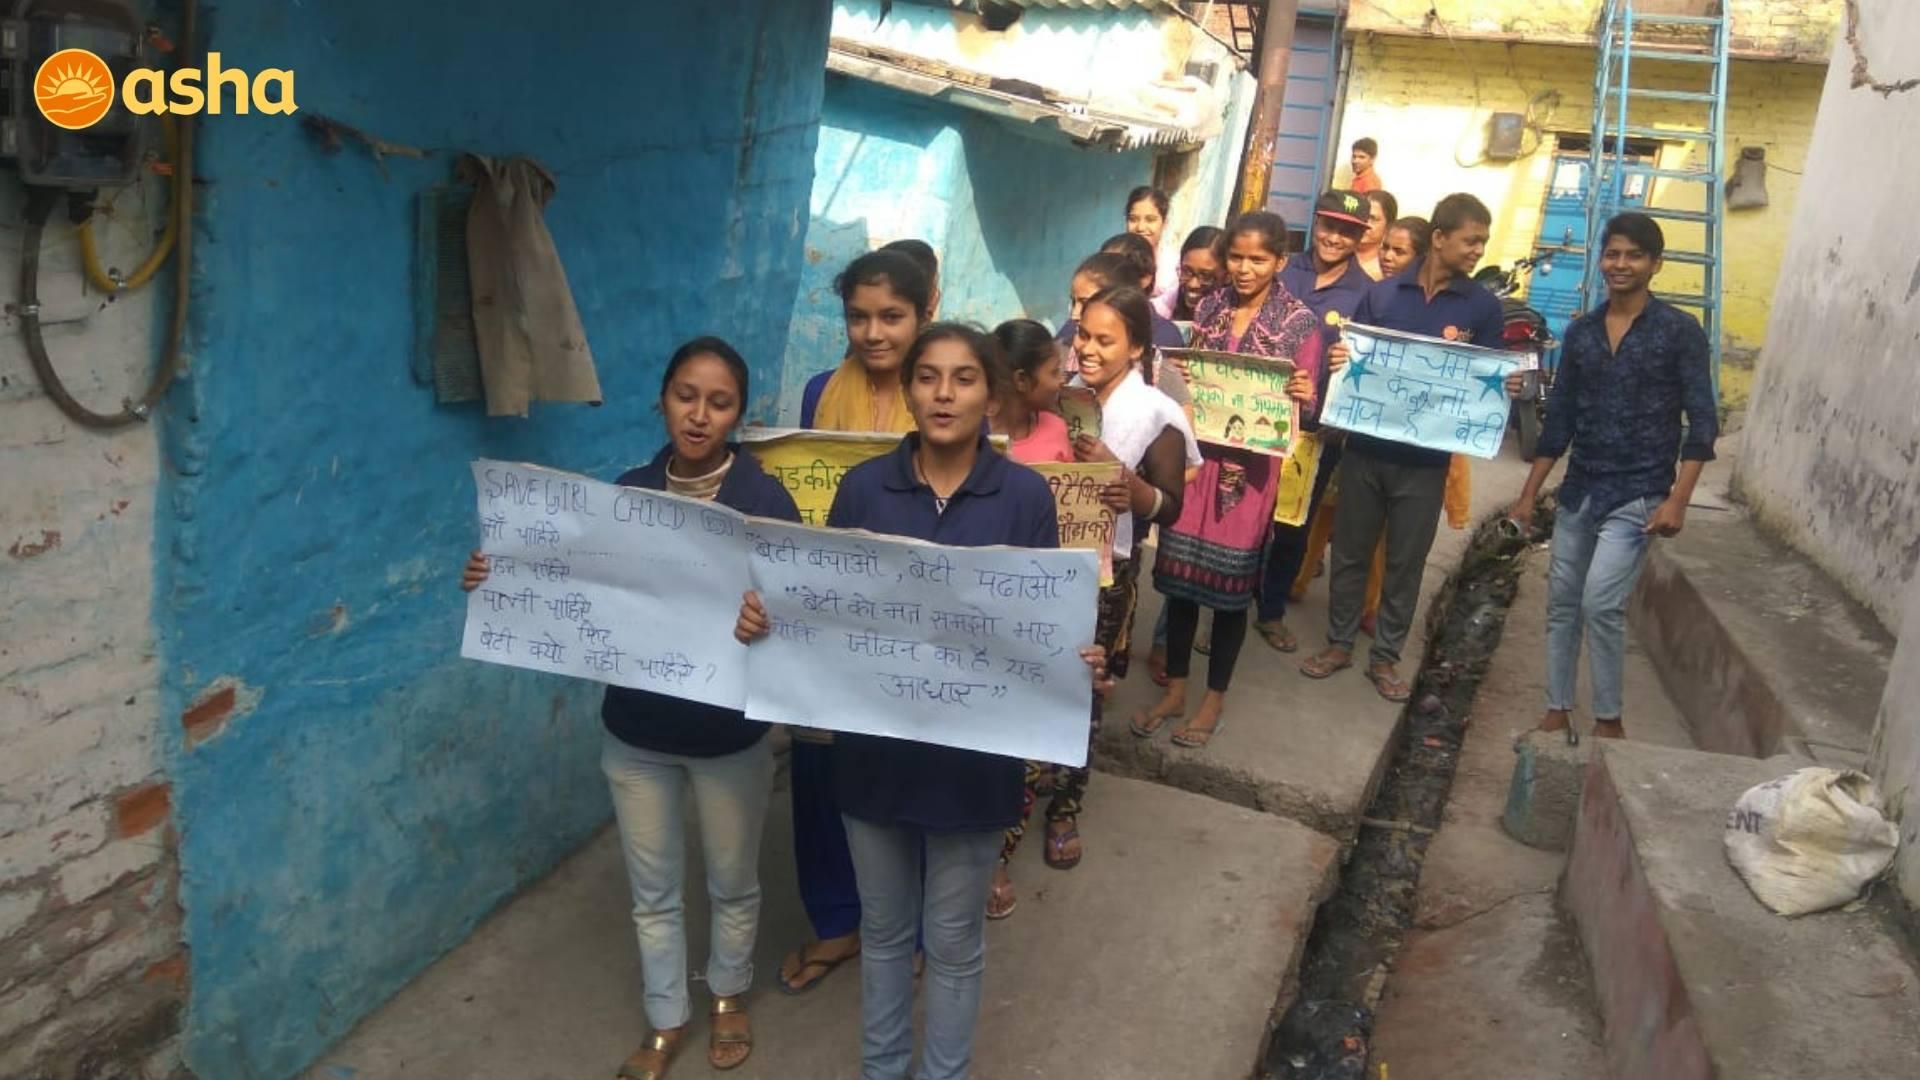 Asha's V. Singh campus's children rallying across the slum